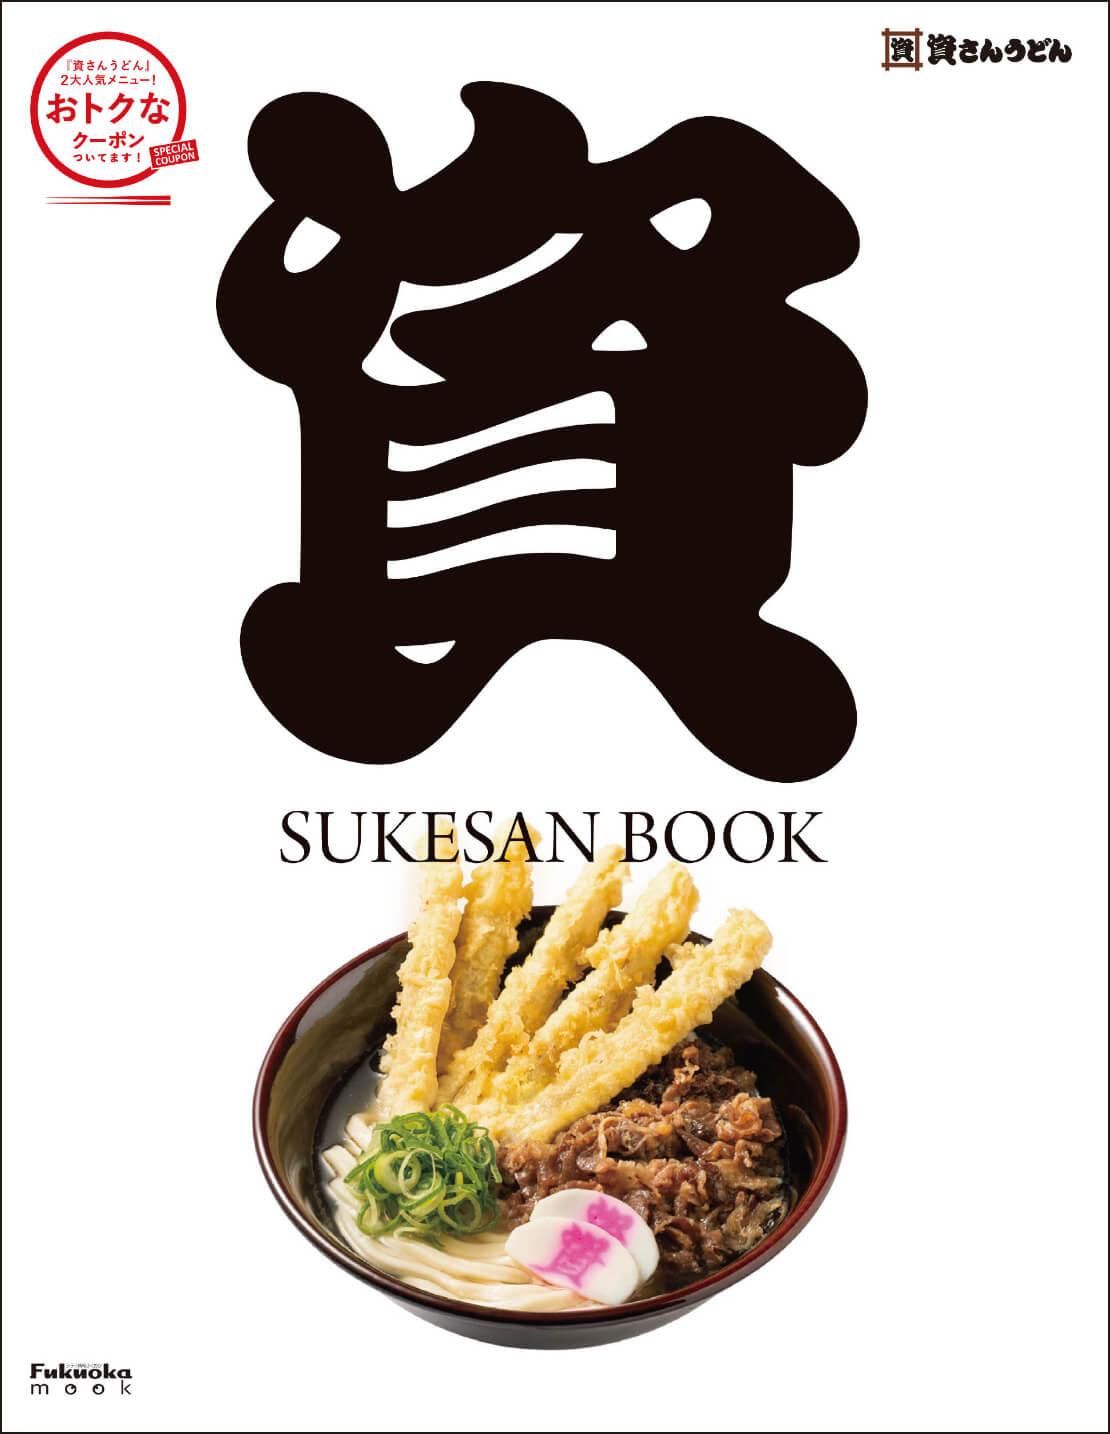 SUKESAN BOOK